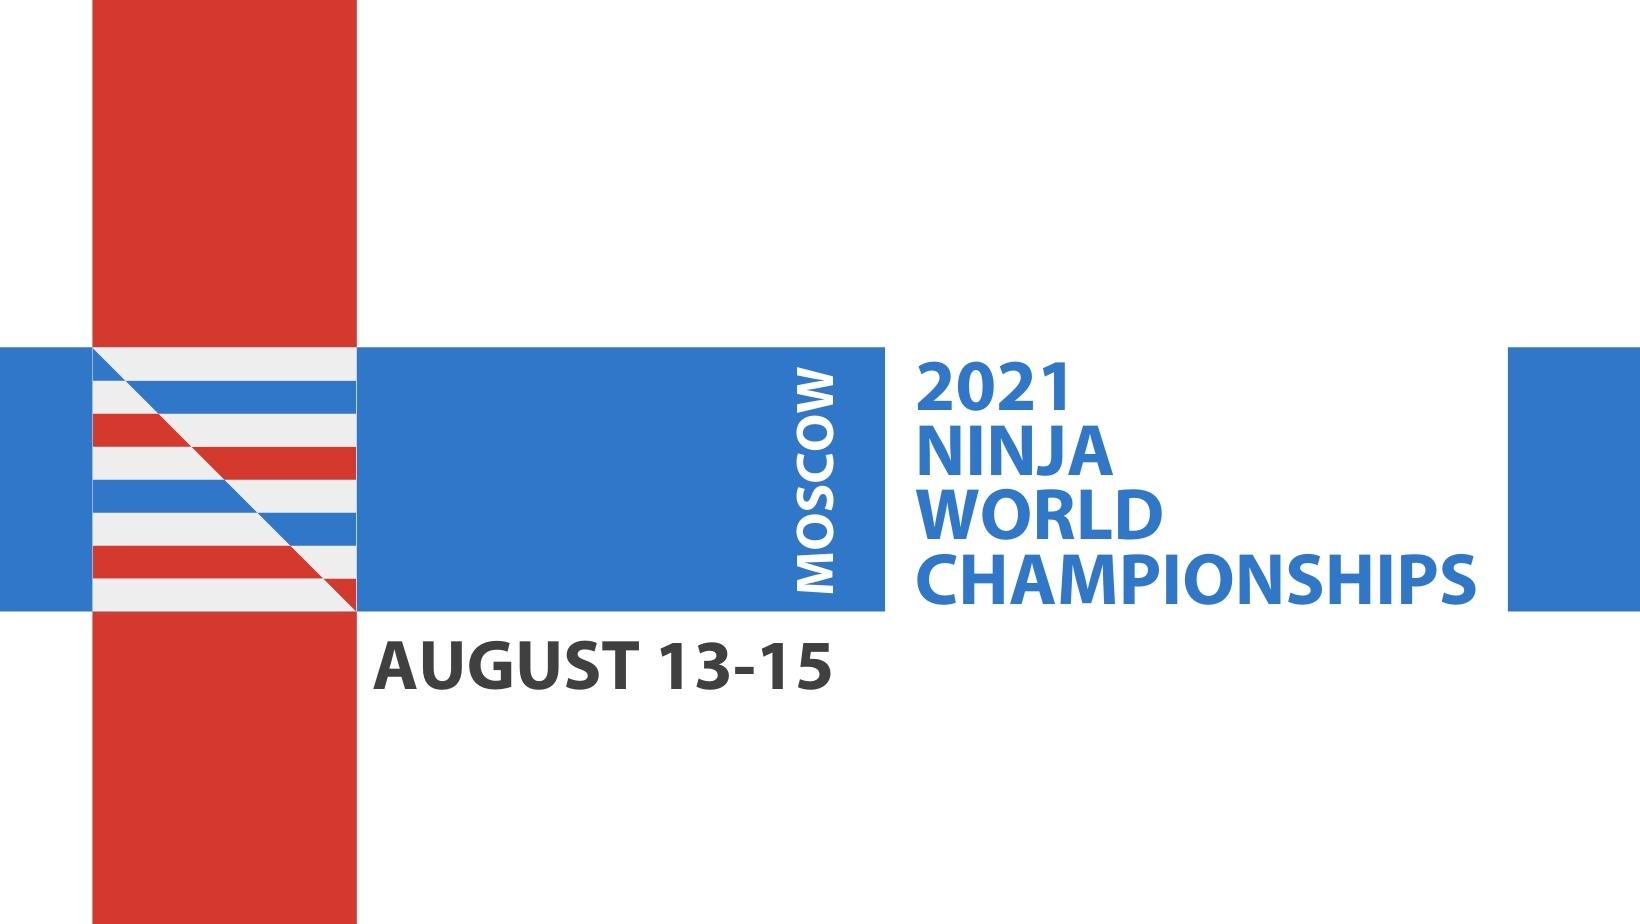 Ninja World Championships